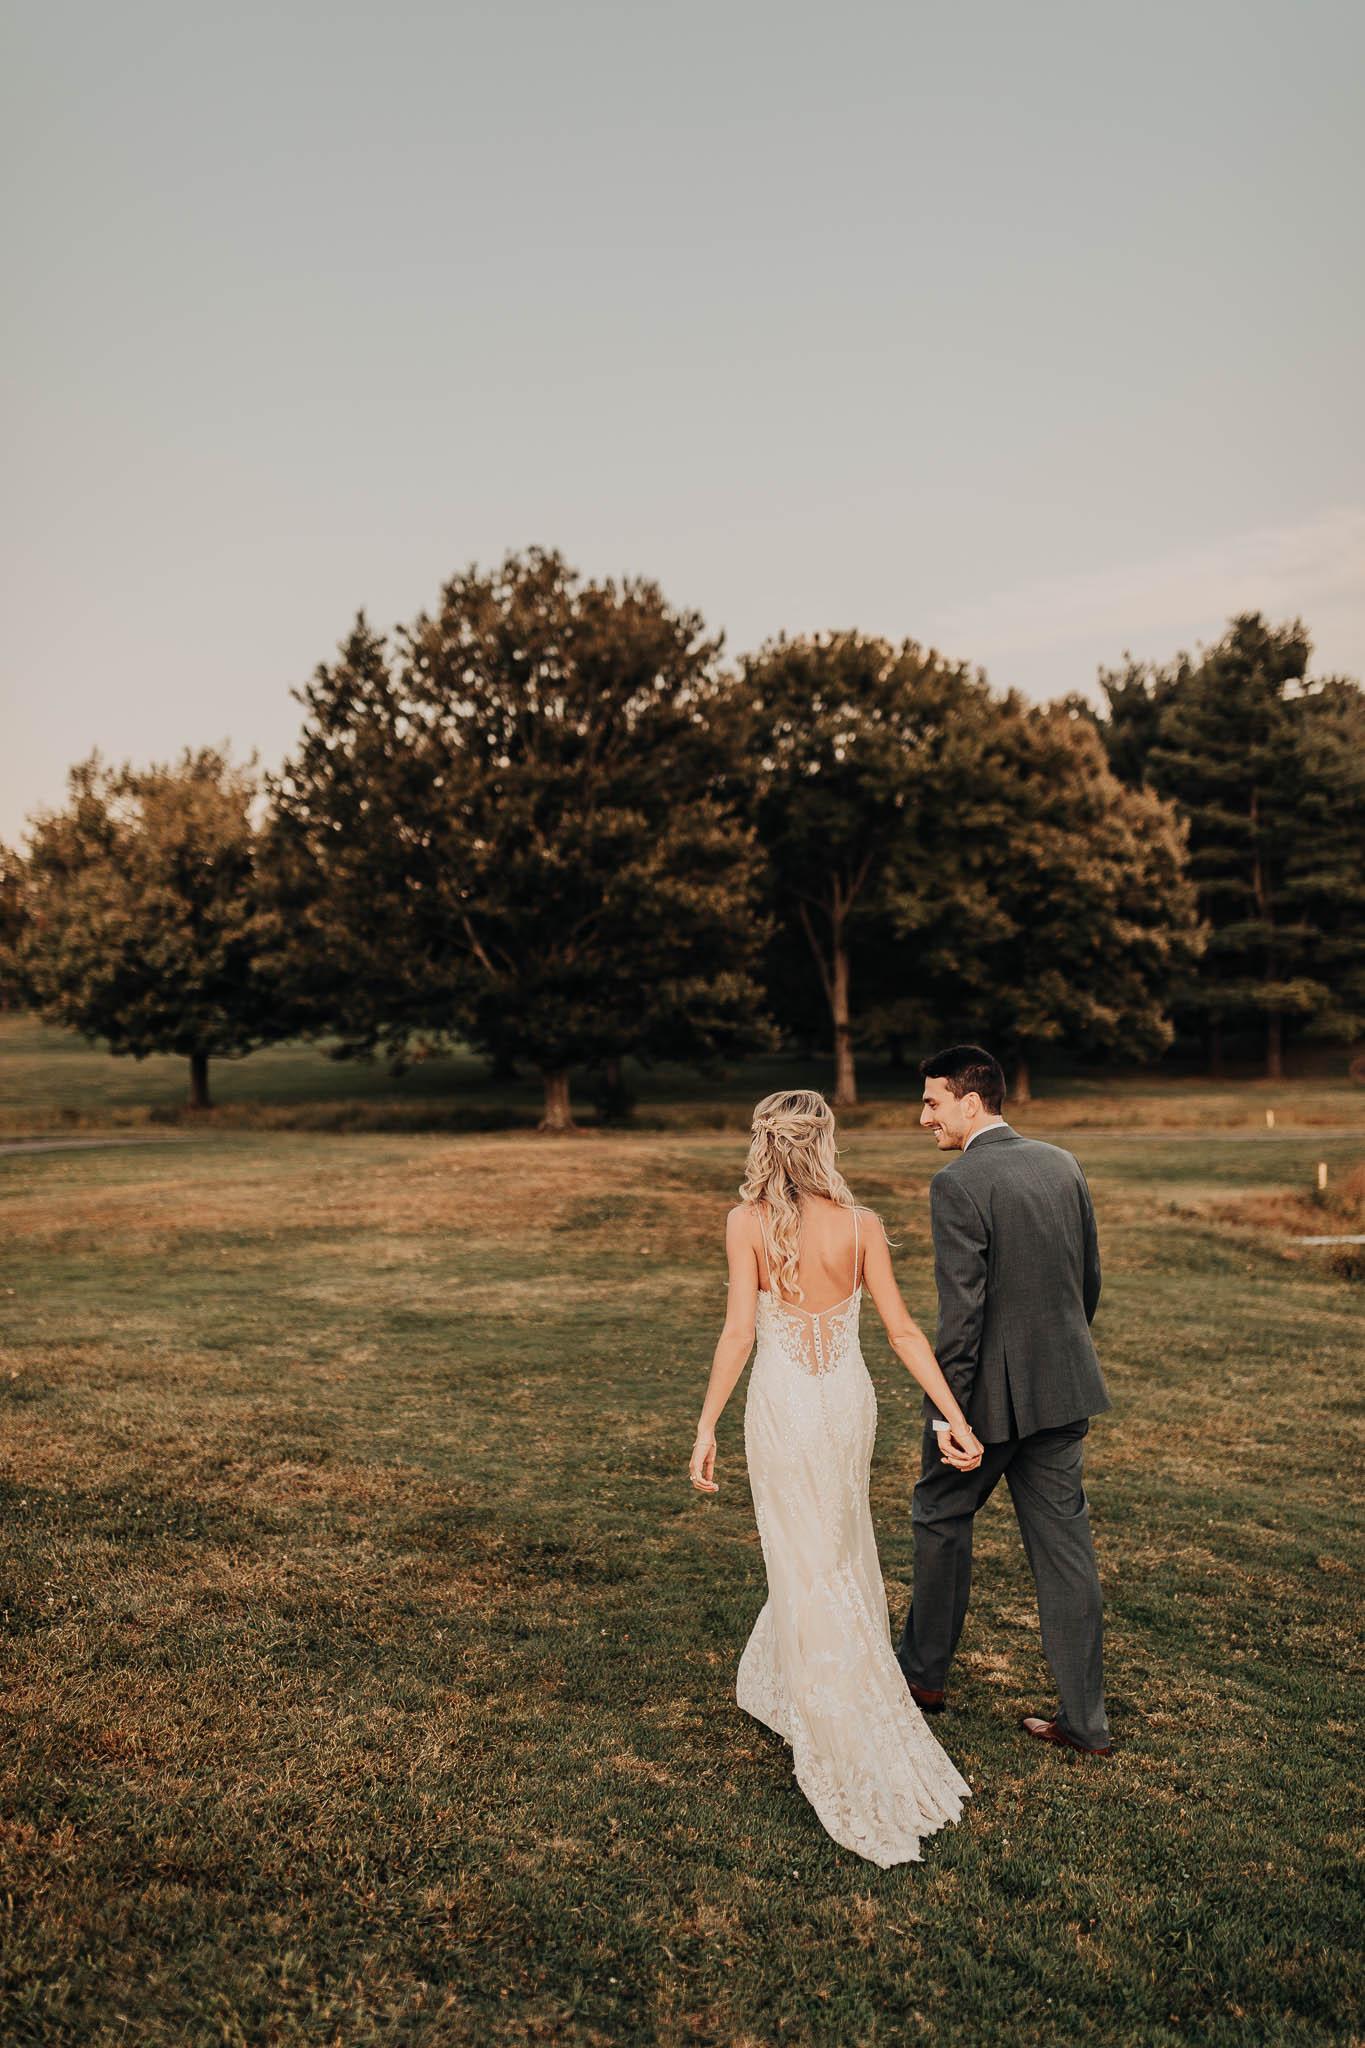 Frosty-Valley-September-Wedding-8278.jpg